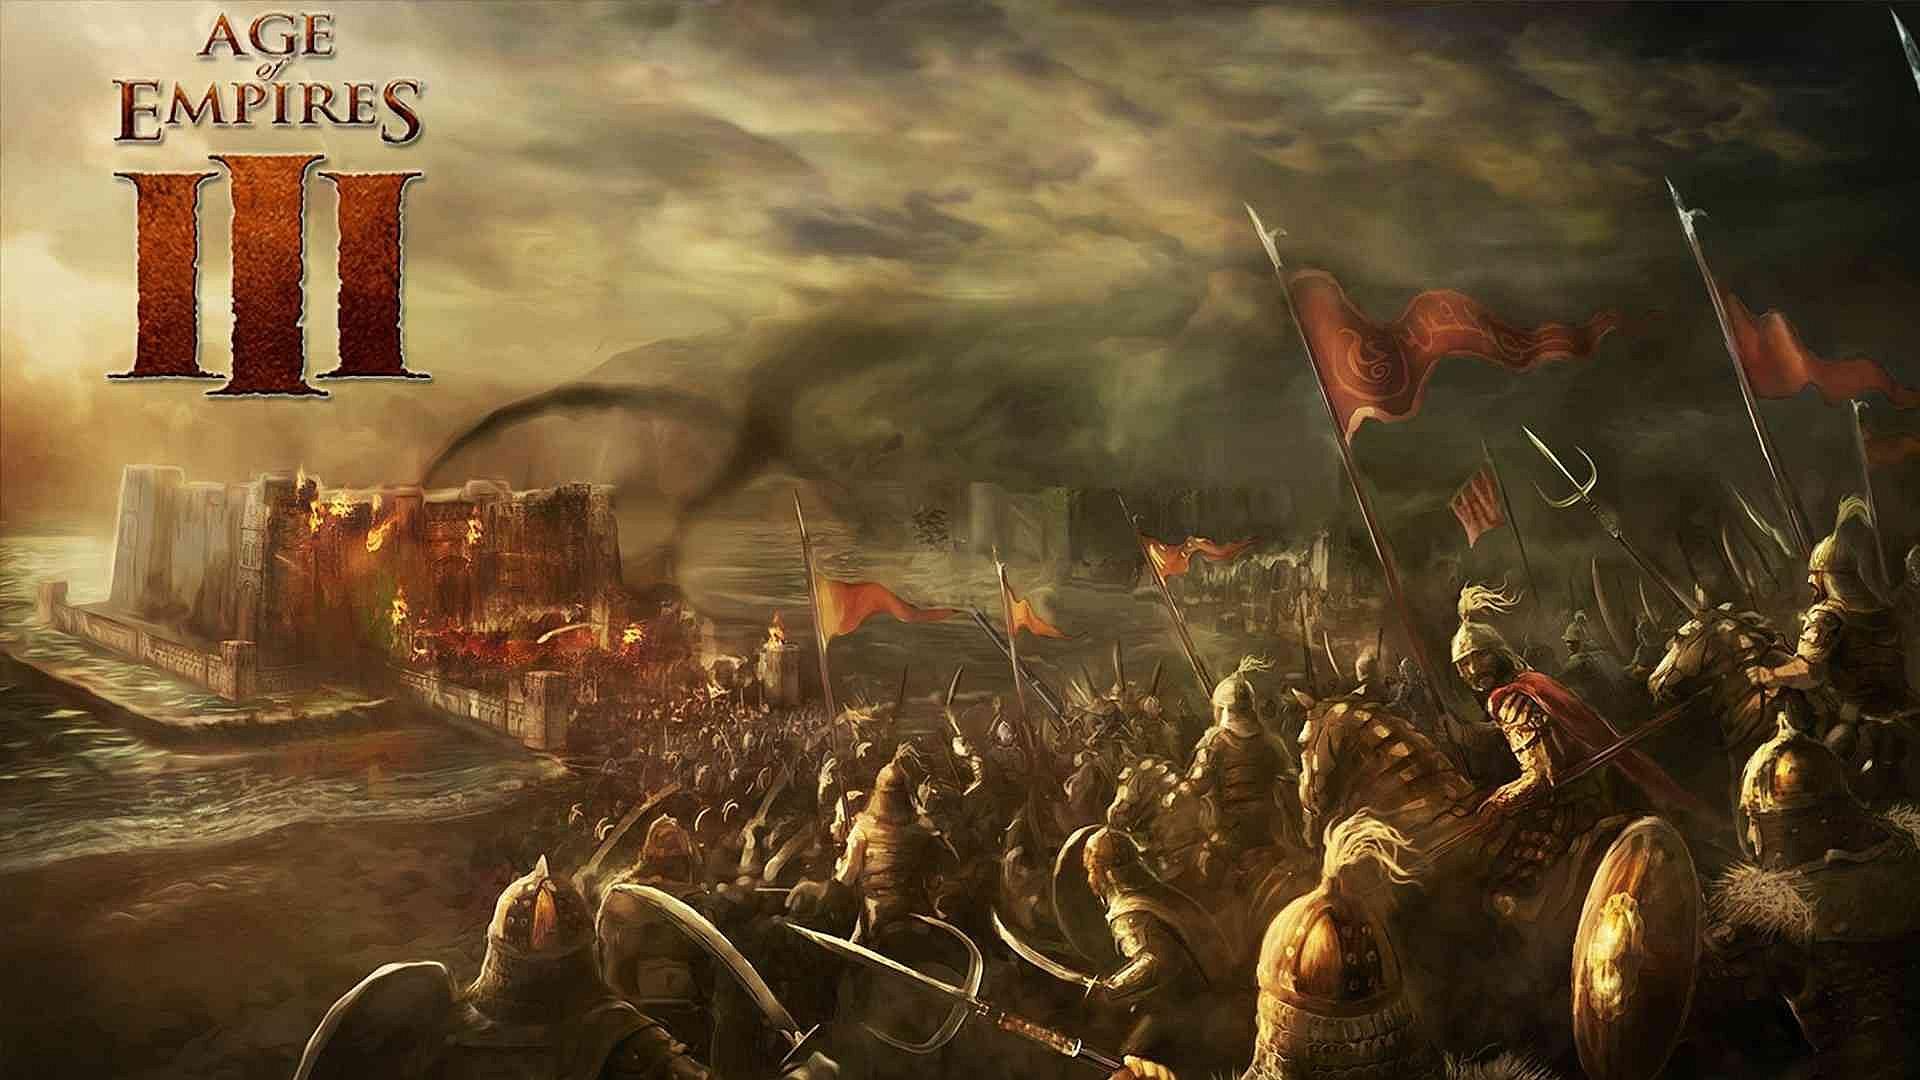 Age of Empires III Definitive Edition Beta